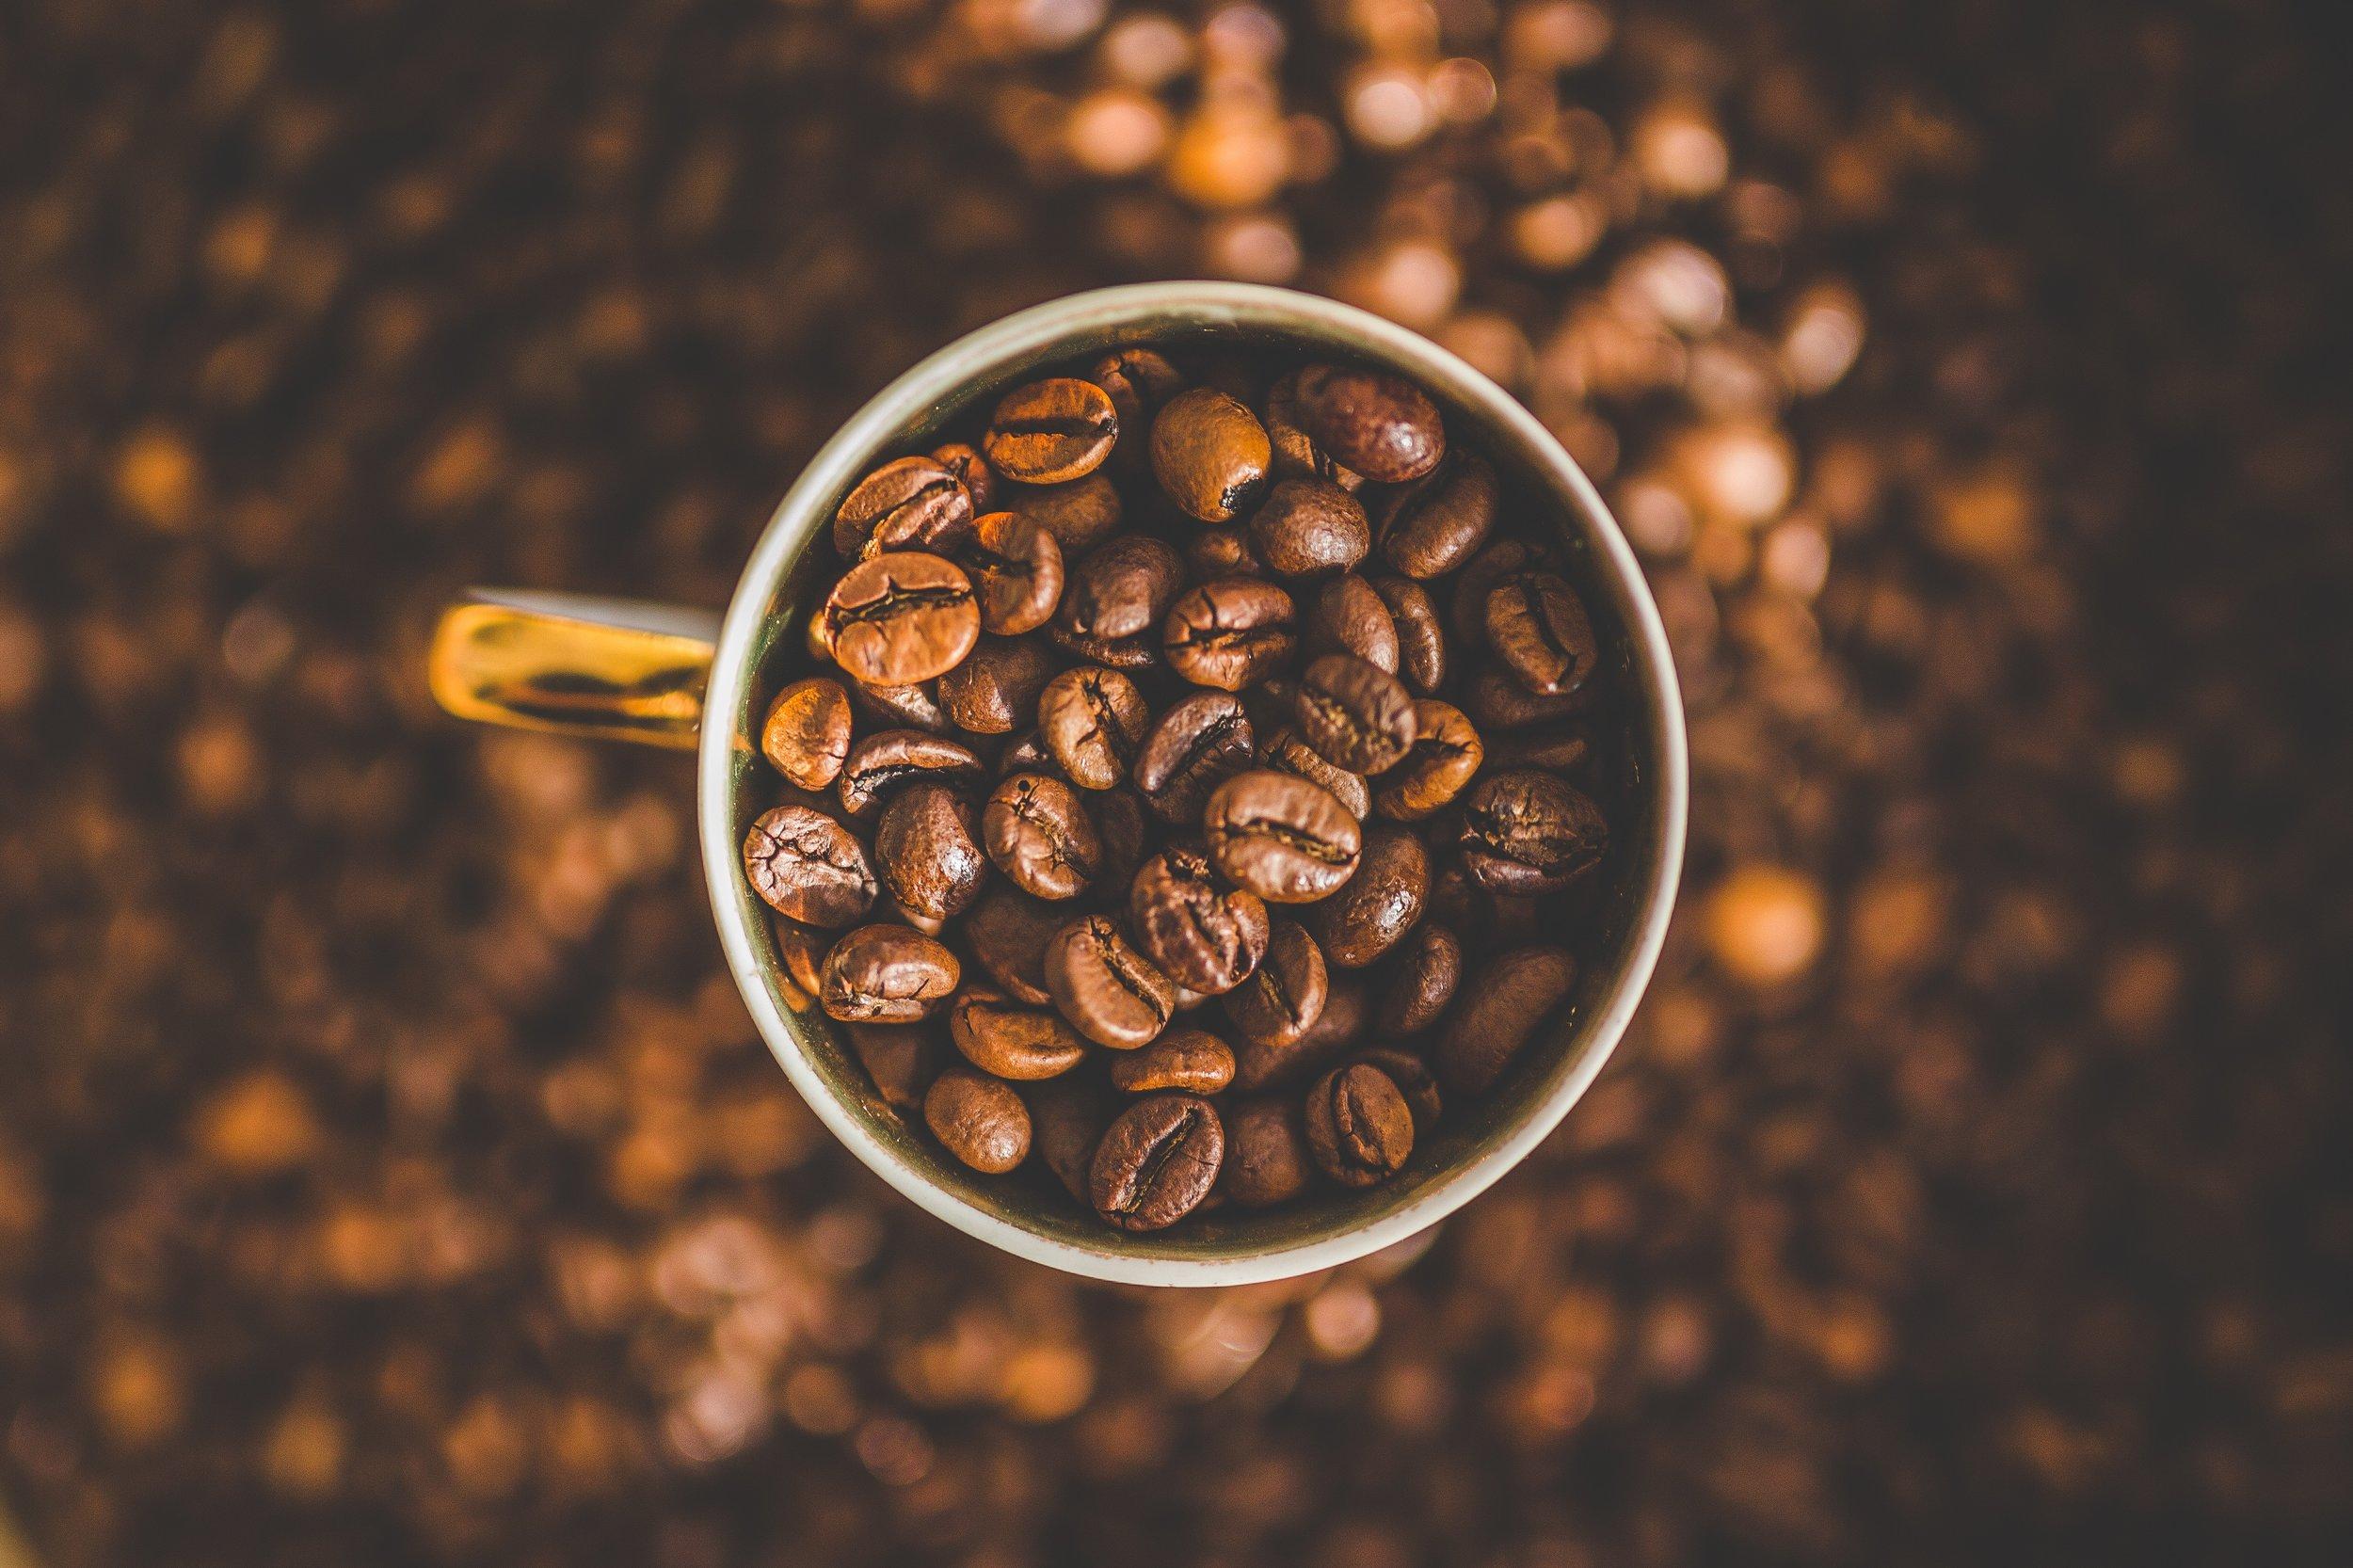 caffeine-coffee-coffee-beans-134577.jpg